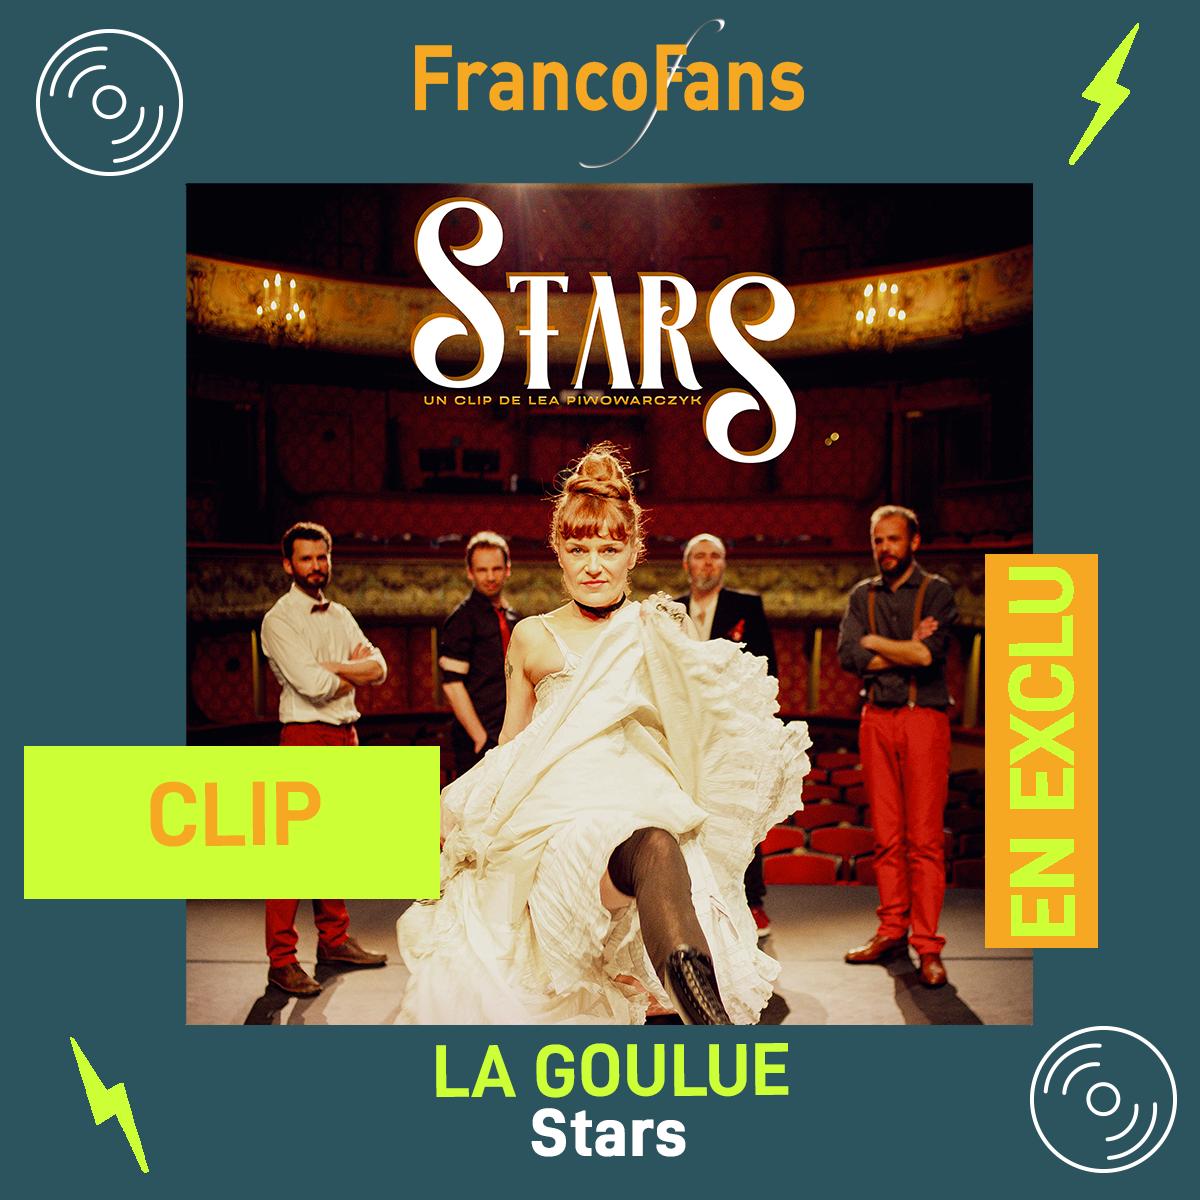 [Clip] La Goulue - Stars